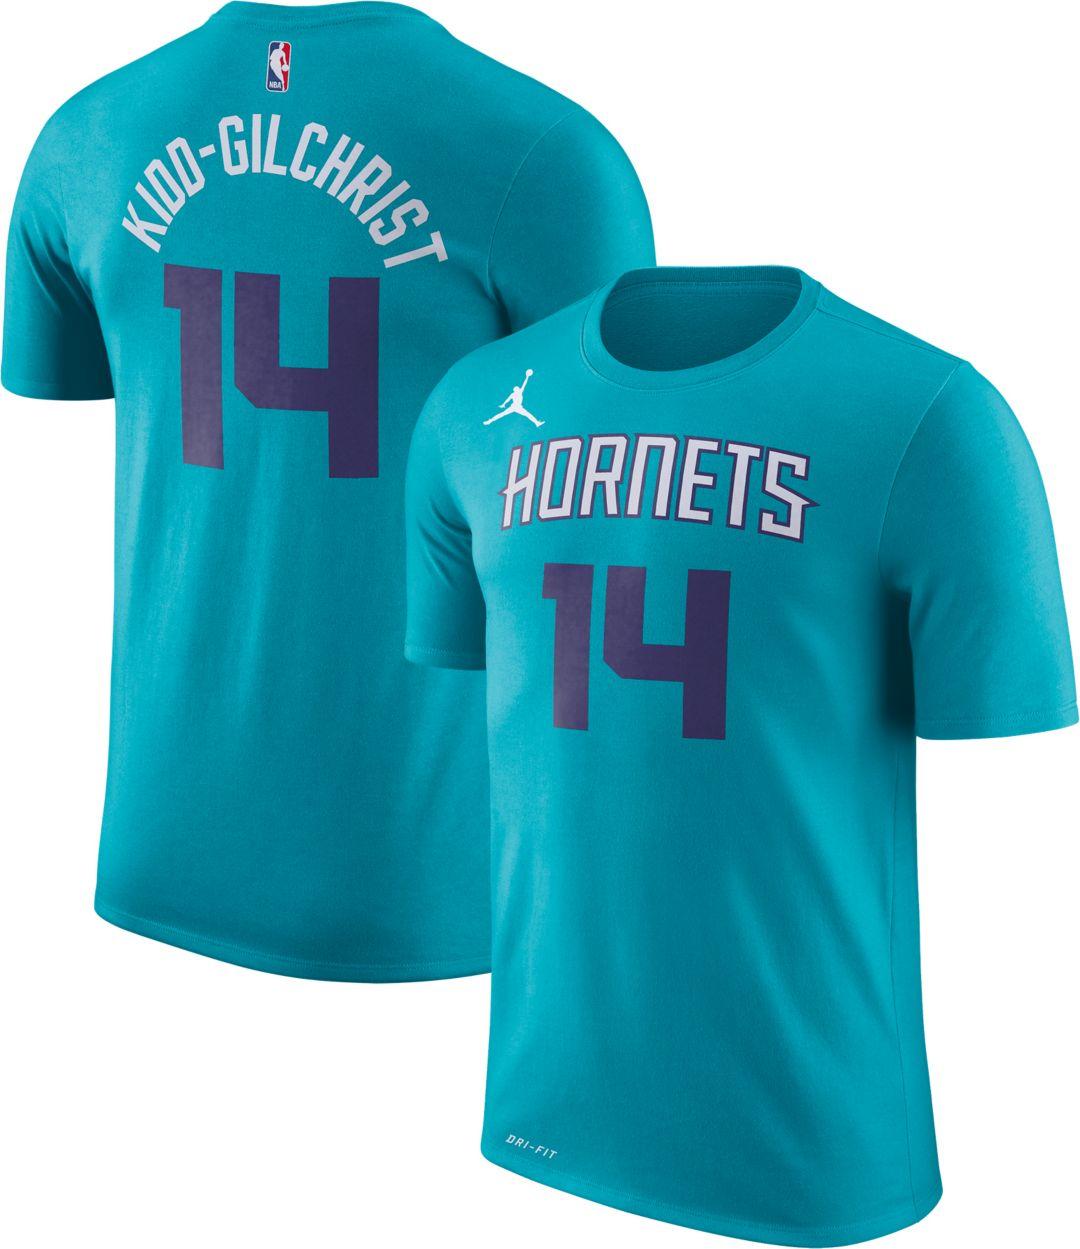 pretty nice d09a5 fbadd Jordan Men's Charlotte Hornets Michael Kidd-Gilchrist #14 Dri-FIT Teal  T-Shirt